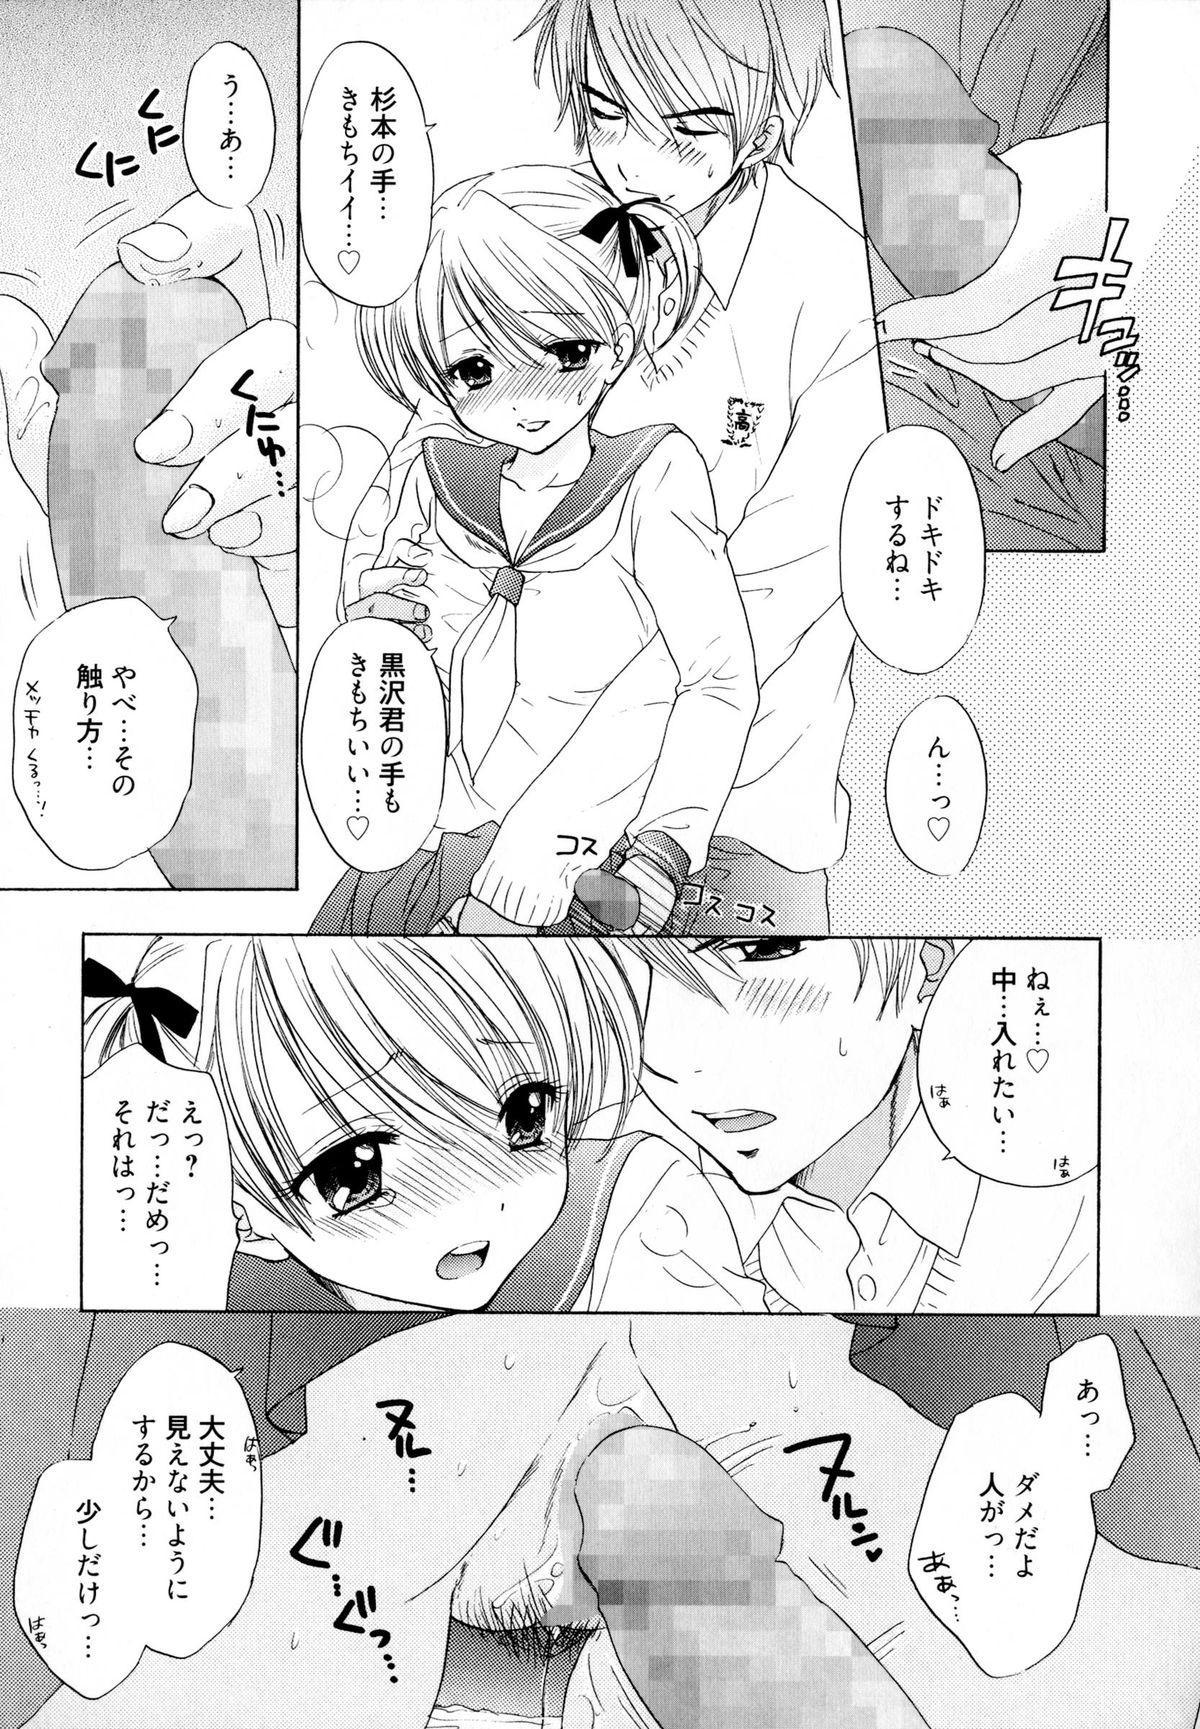 The Great Escape 4 Shokai Genteiban 66